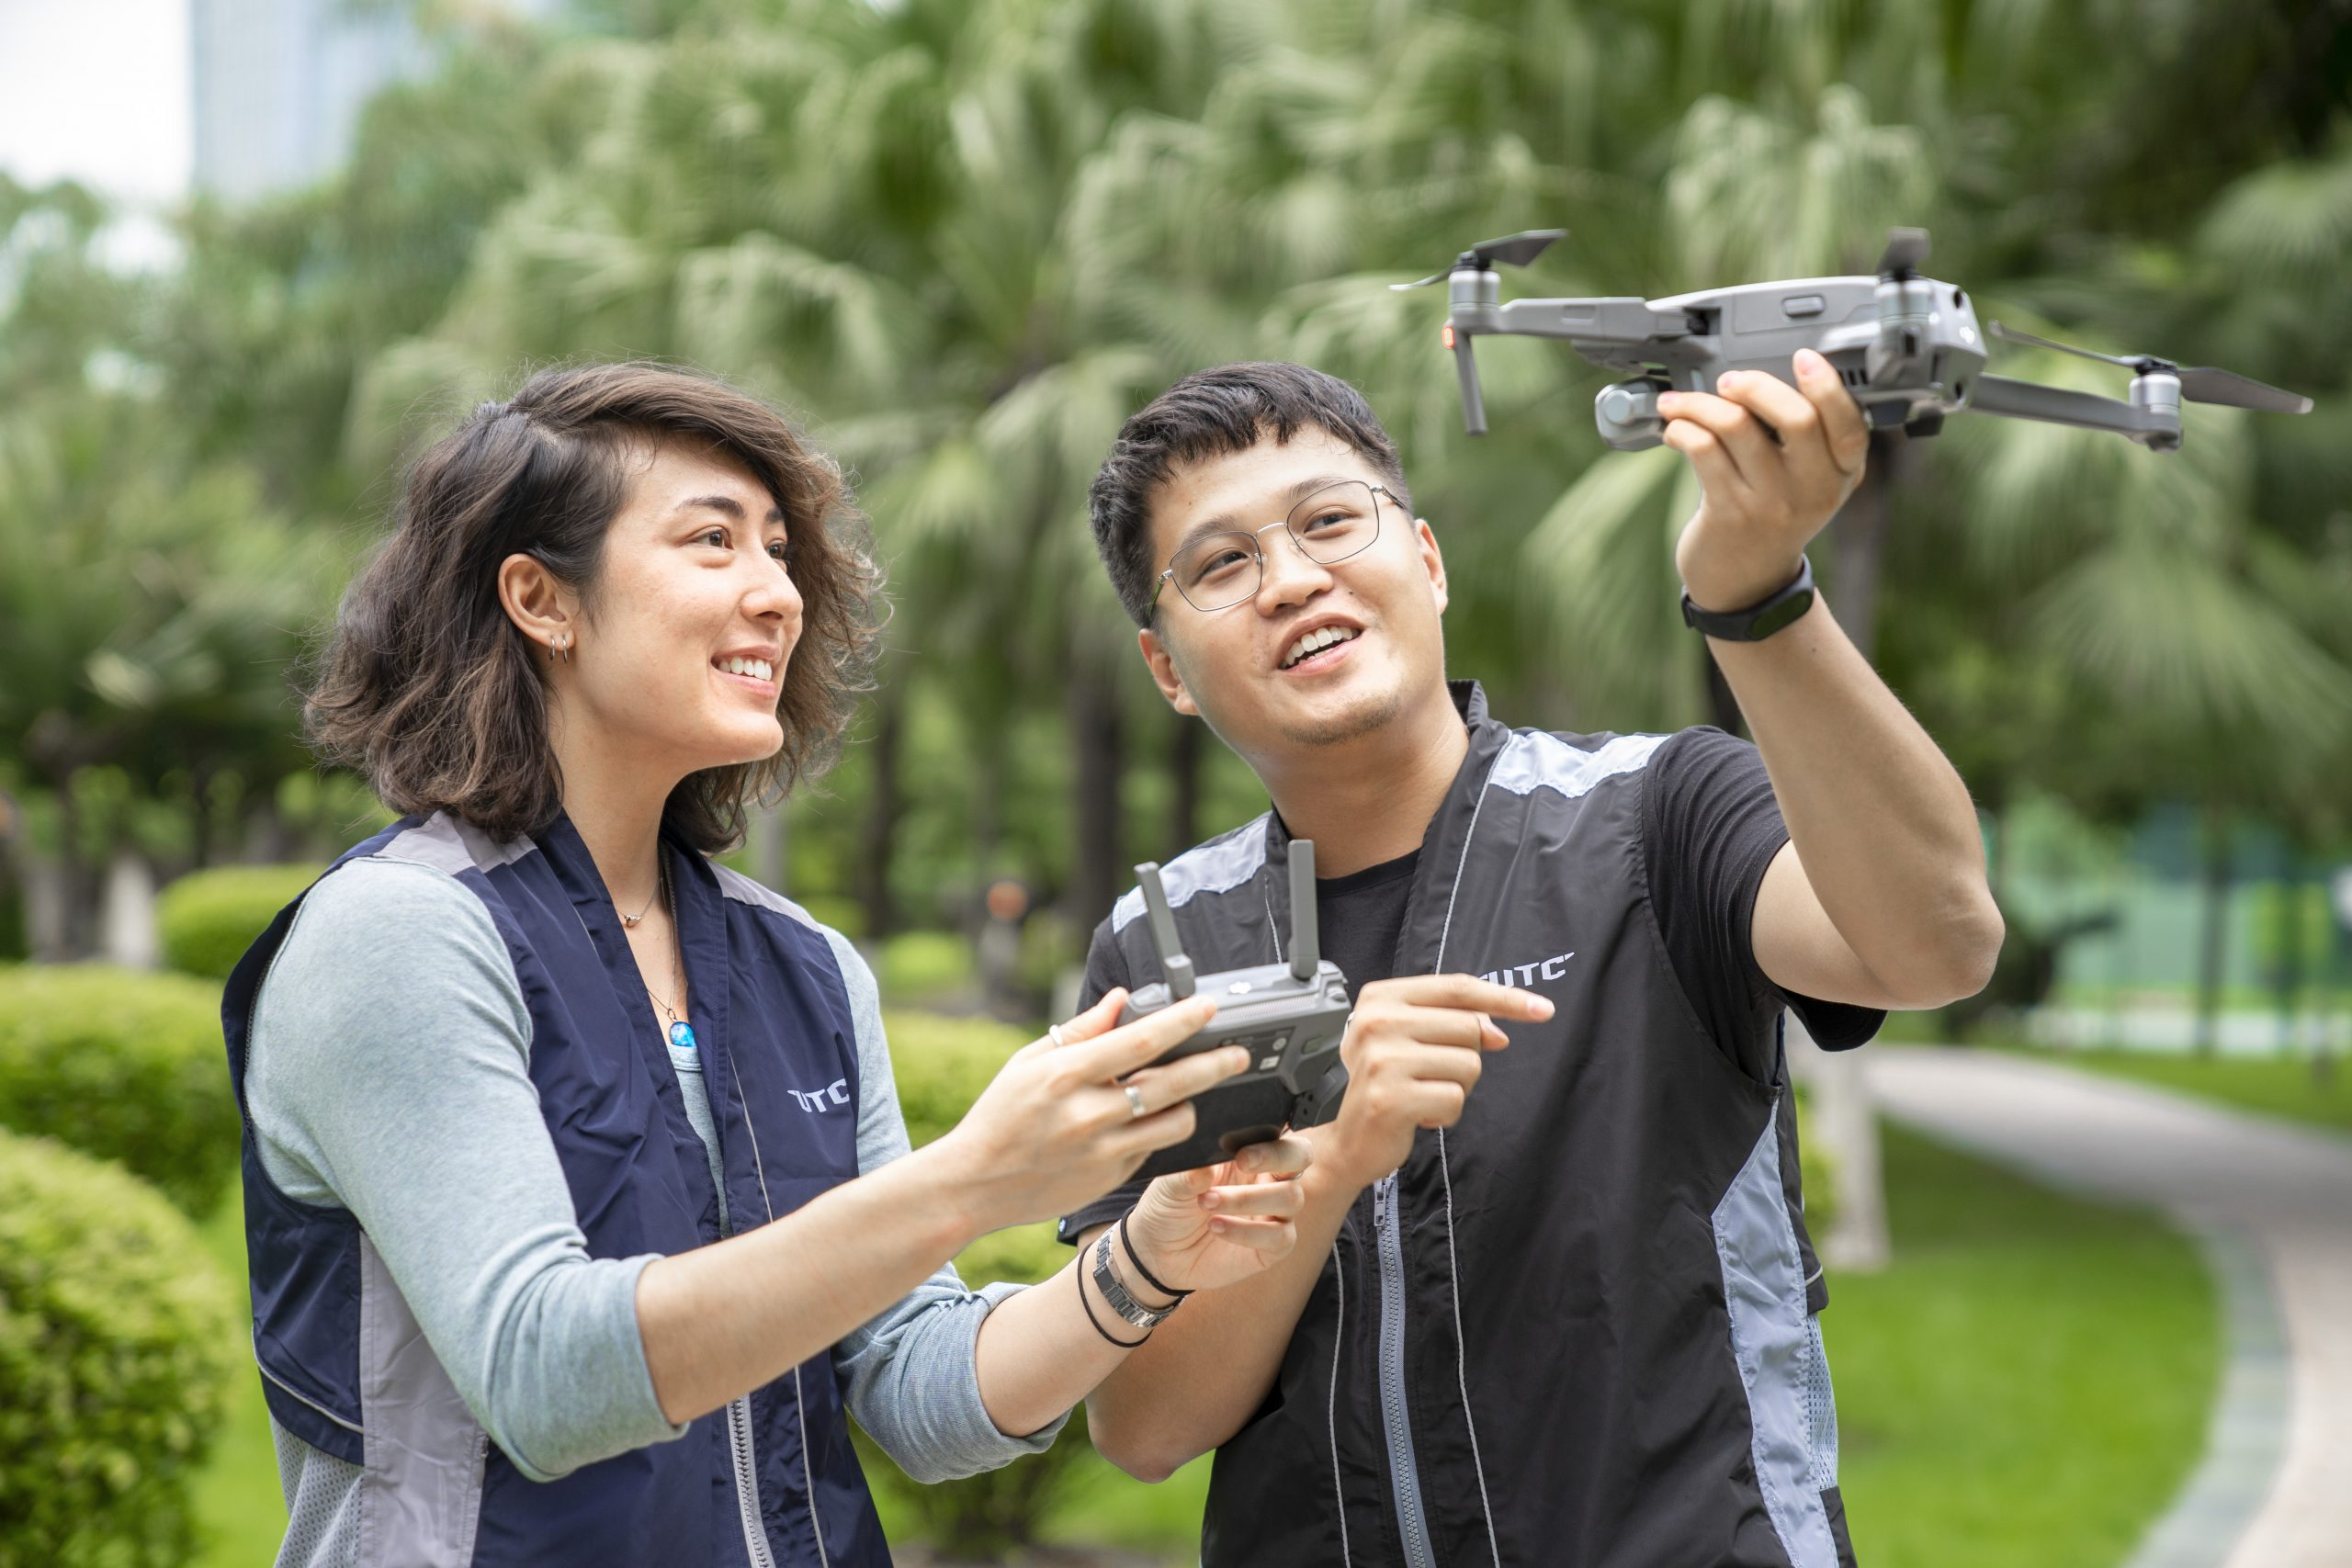 Instructors of Drone Training Malaysia preparing for UAS Pilot Training